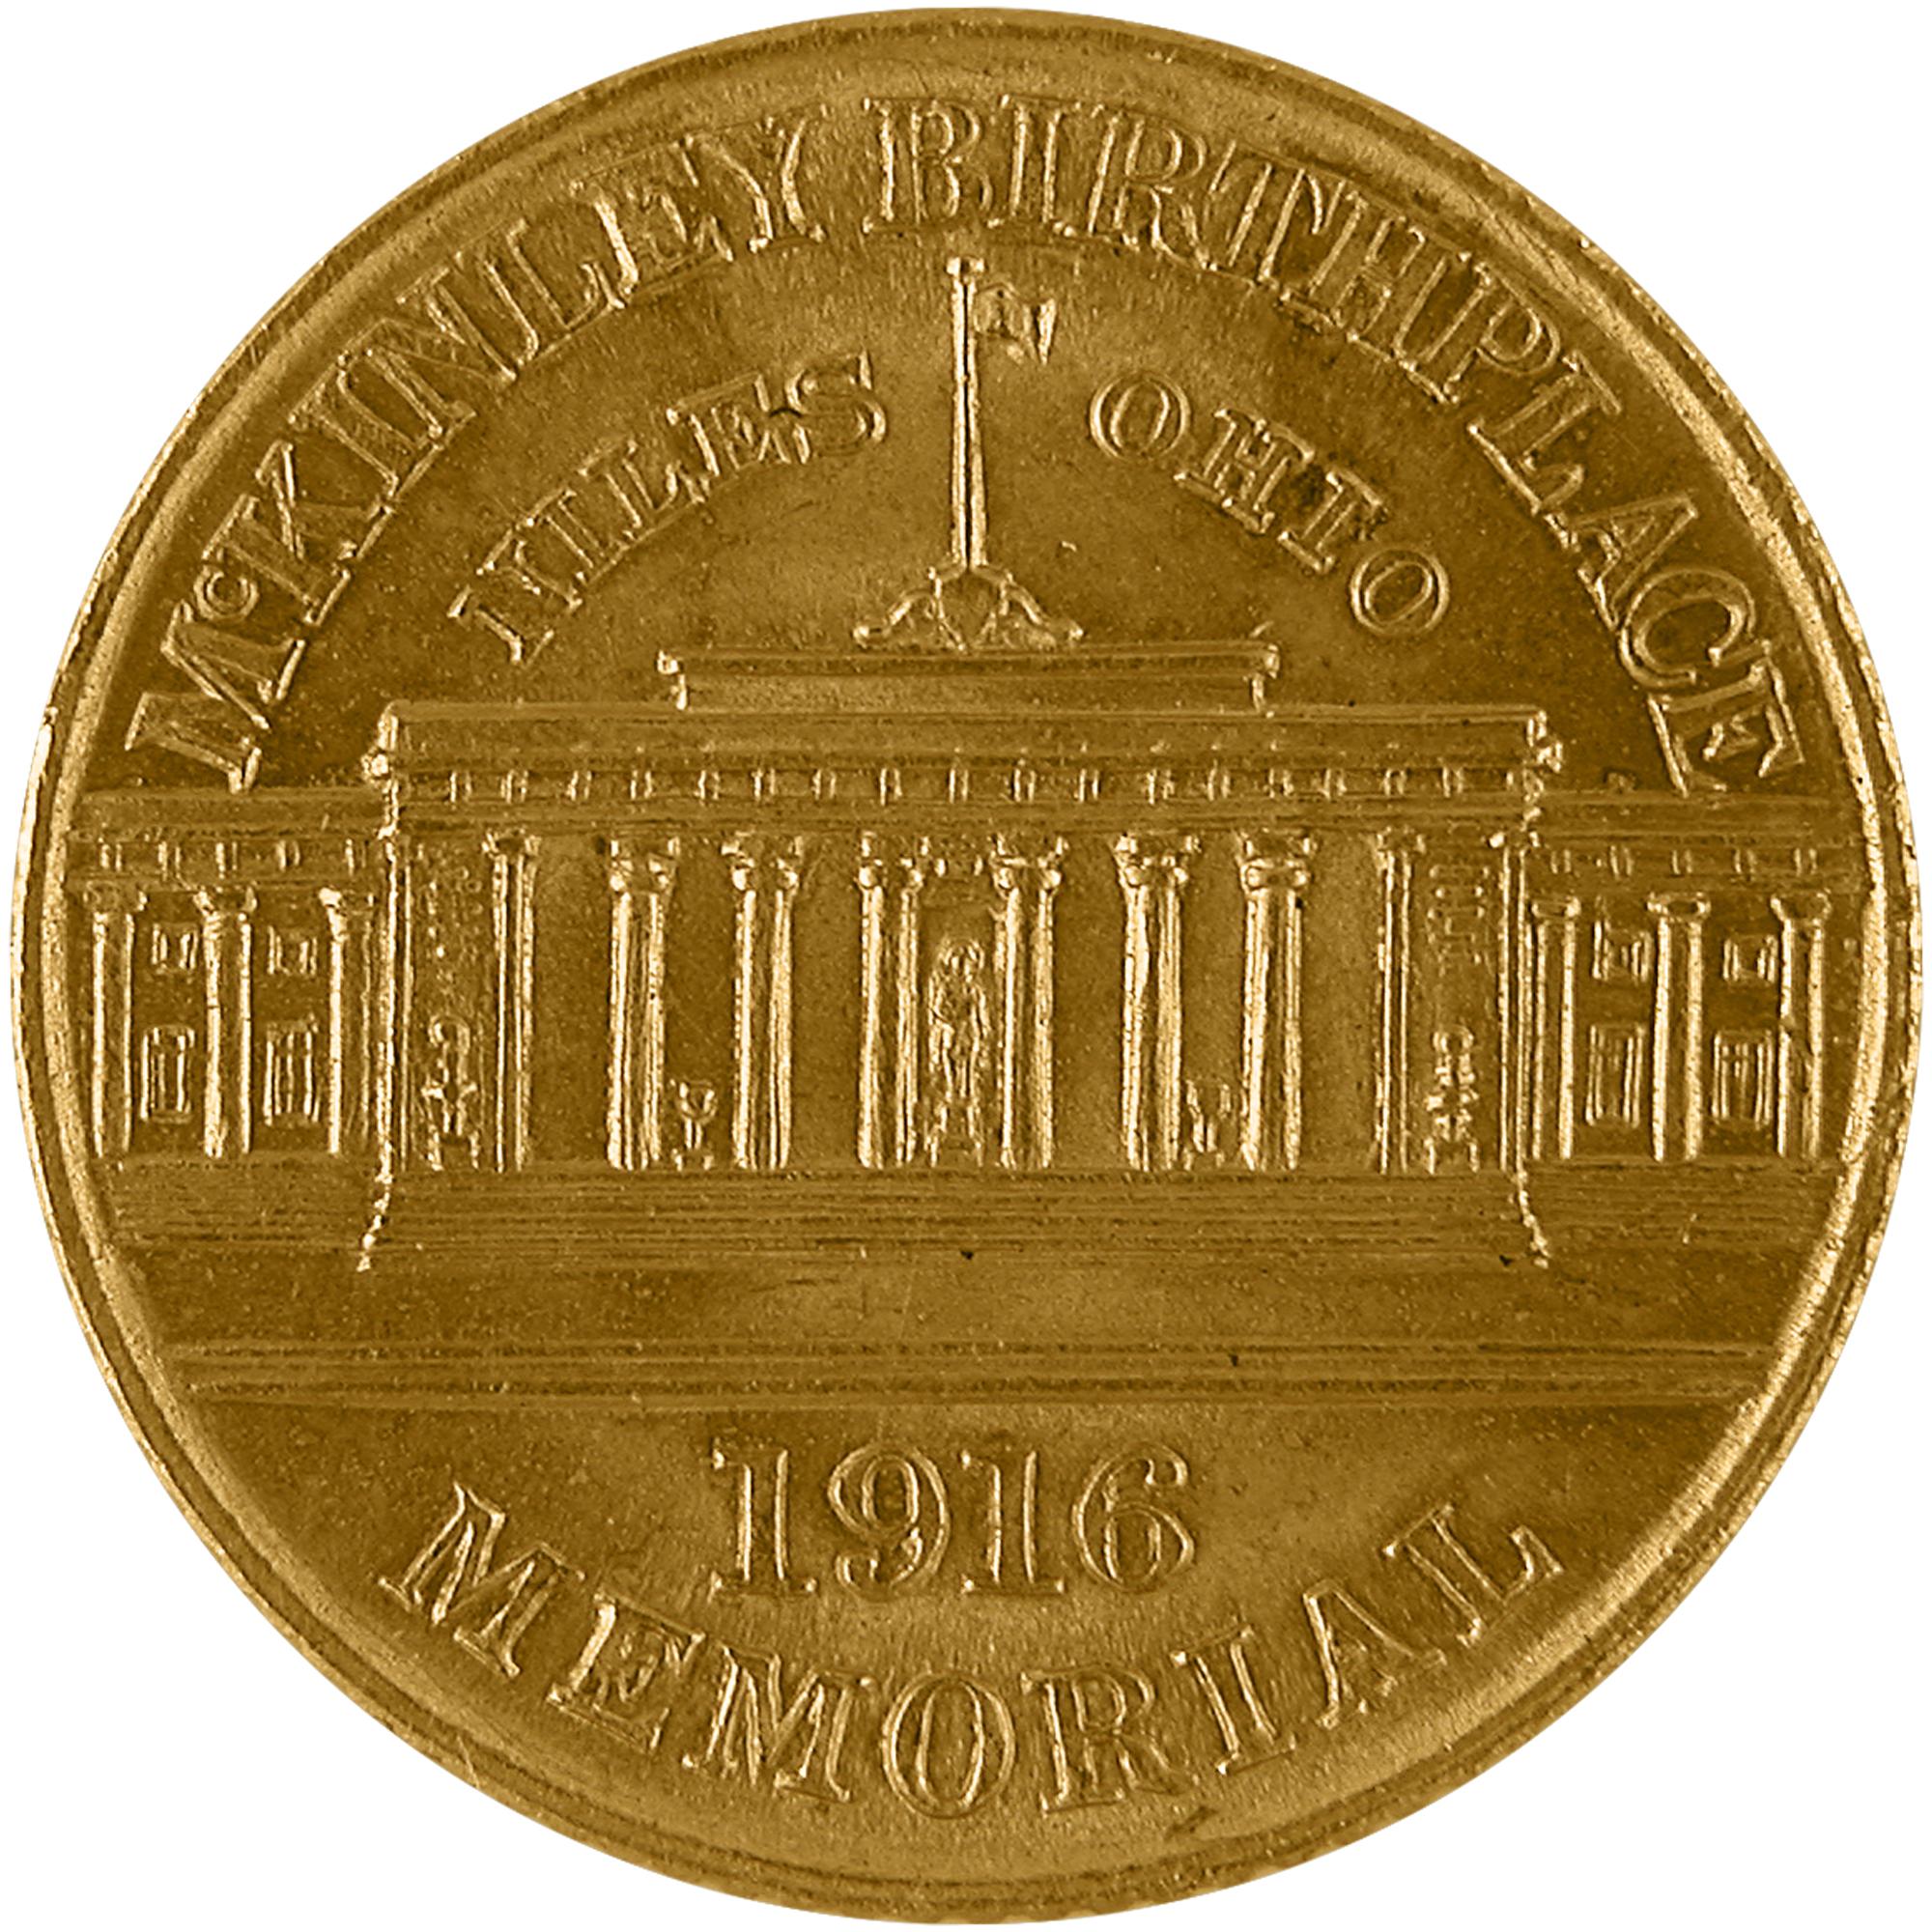 1916 William Mckinley Memorial Commemorative Gold One Dollar Coin Reverse